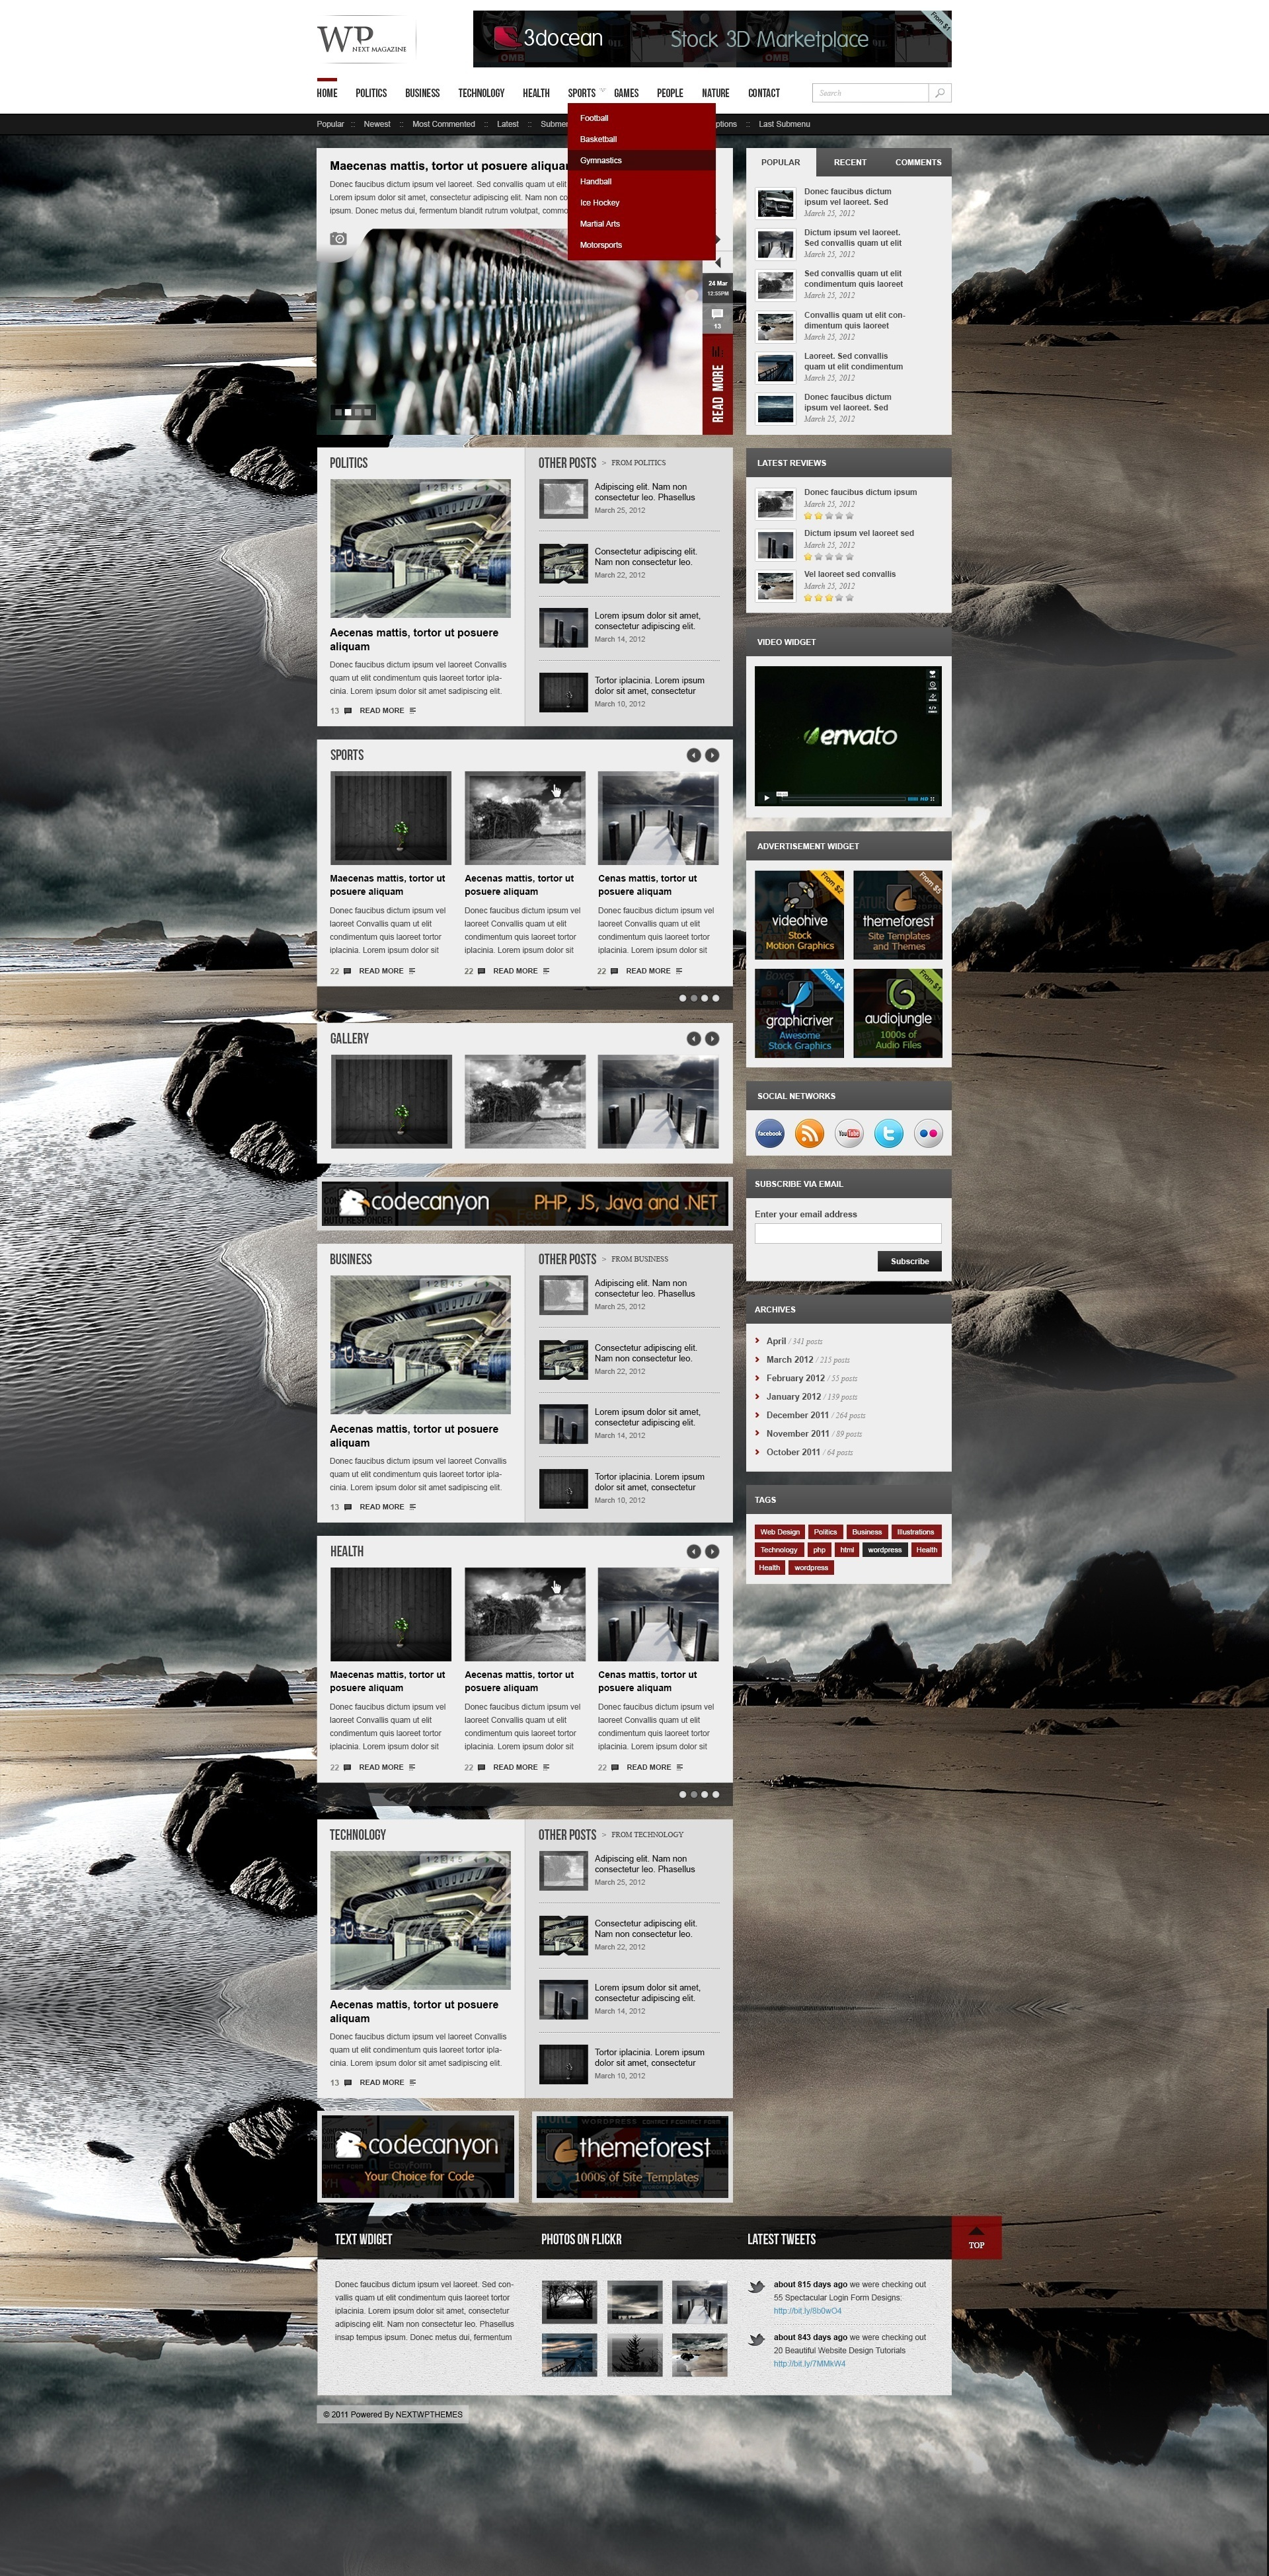 http://1.s3.envato.com/files/47408297/screenshots/01_Homepage.jpg